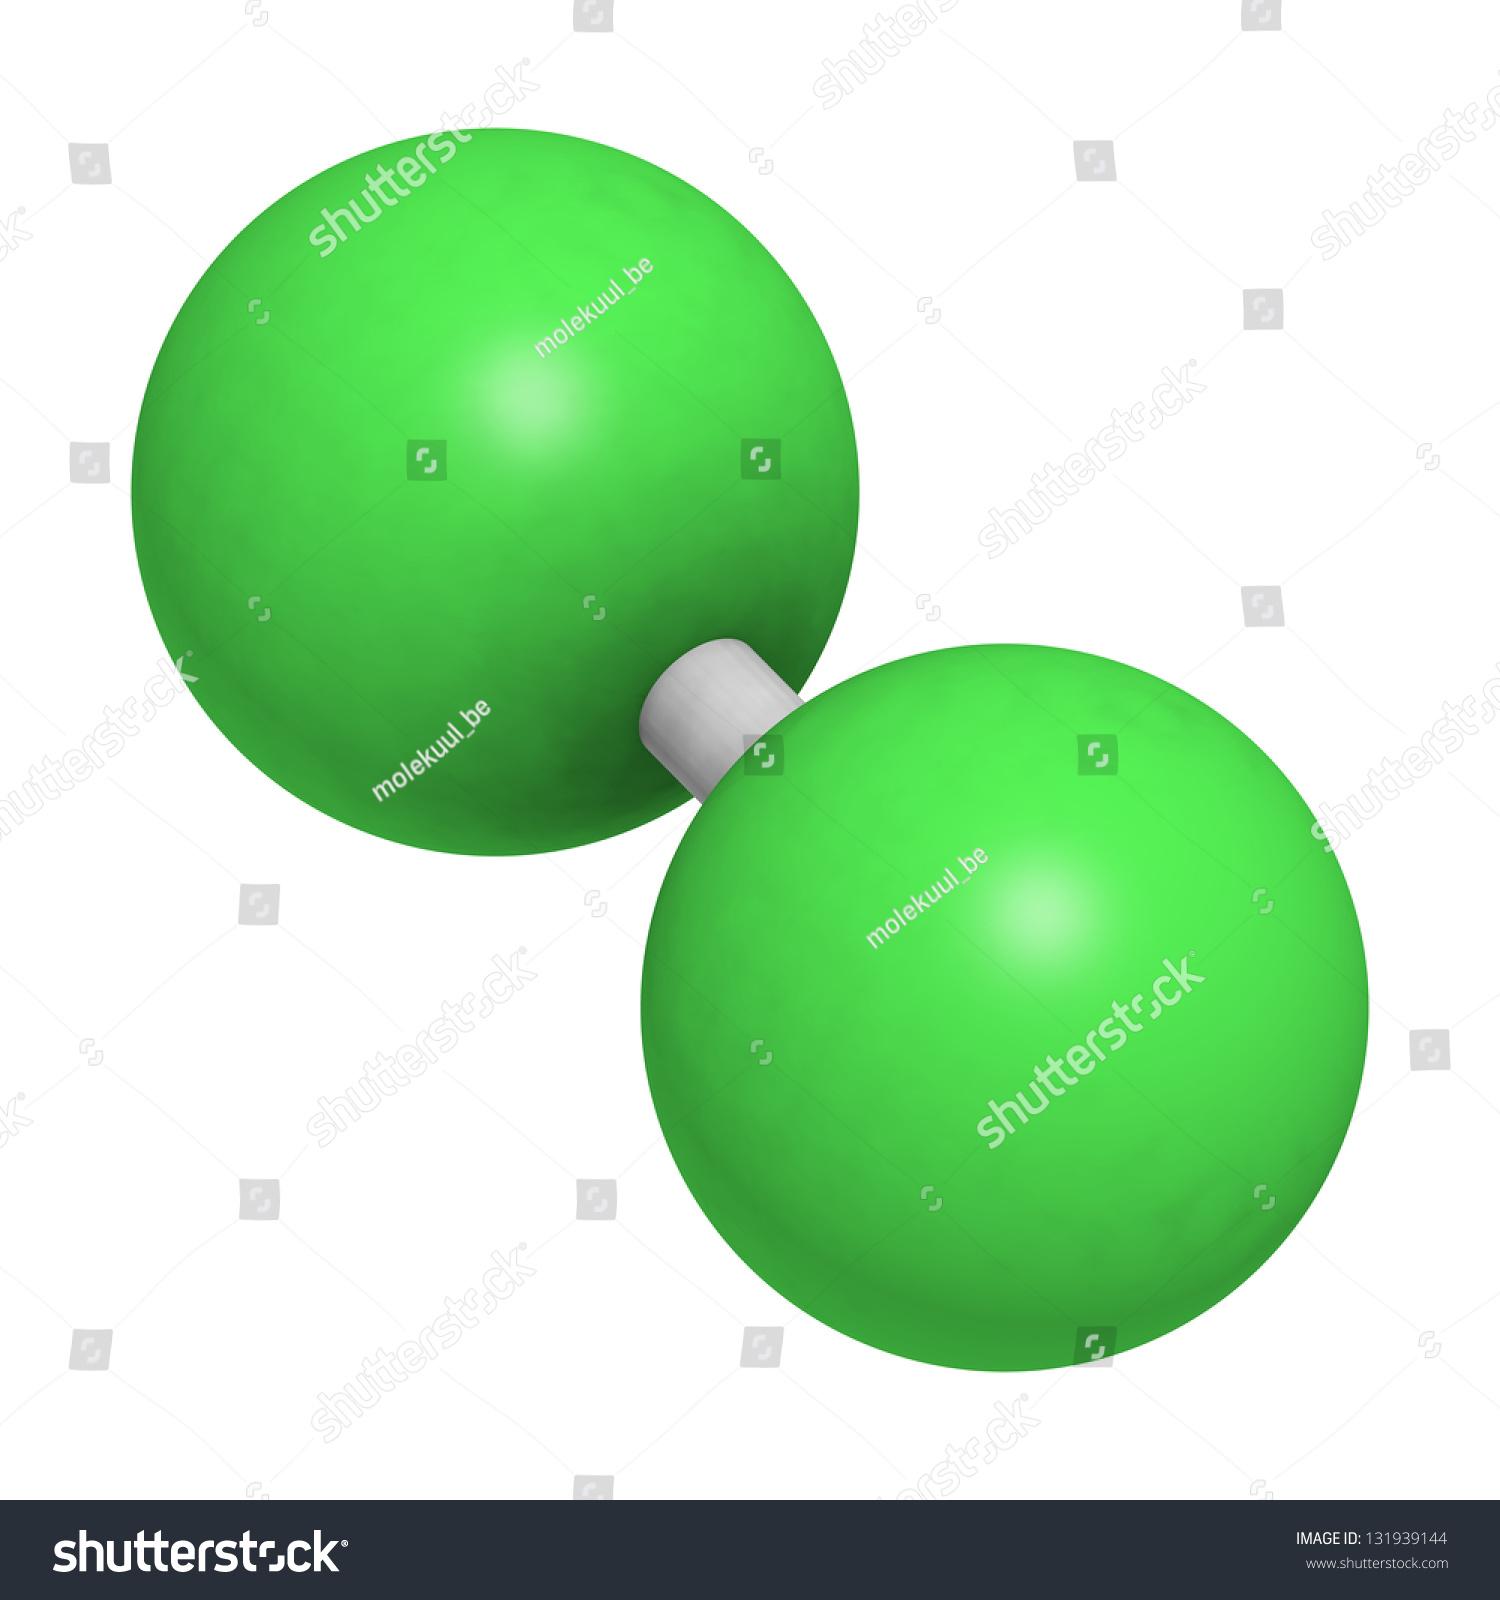 Elemental Chlorine Cl2 Molecular Model Atoms Stock